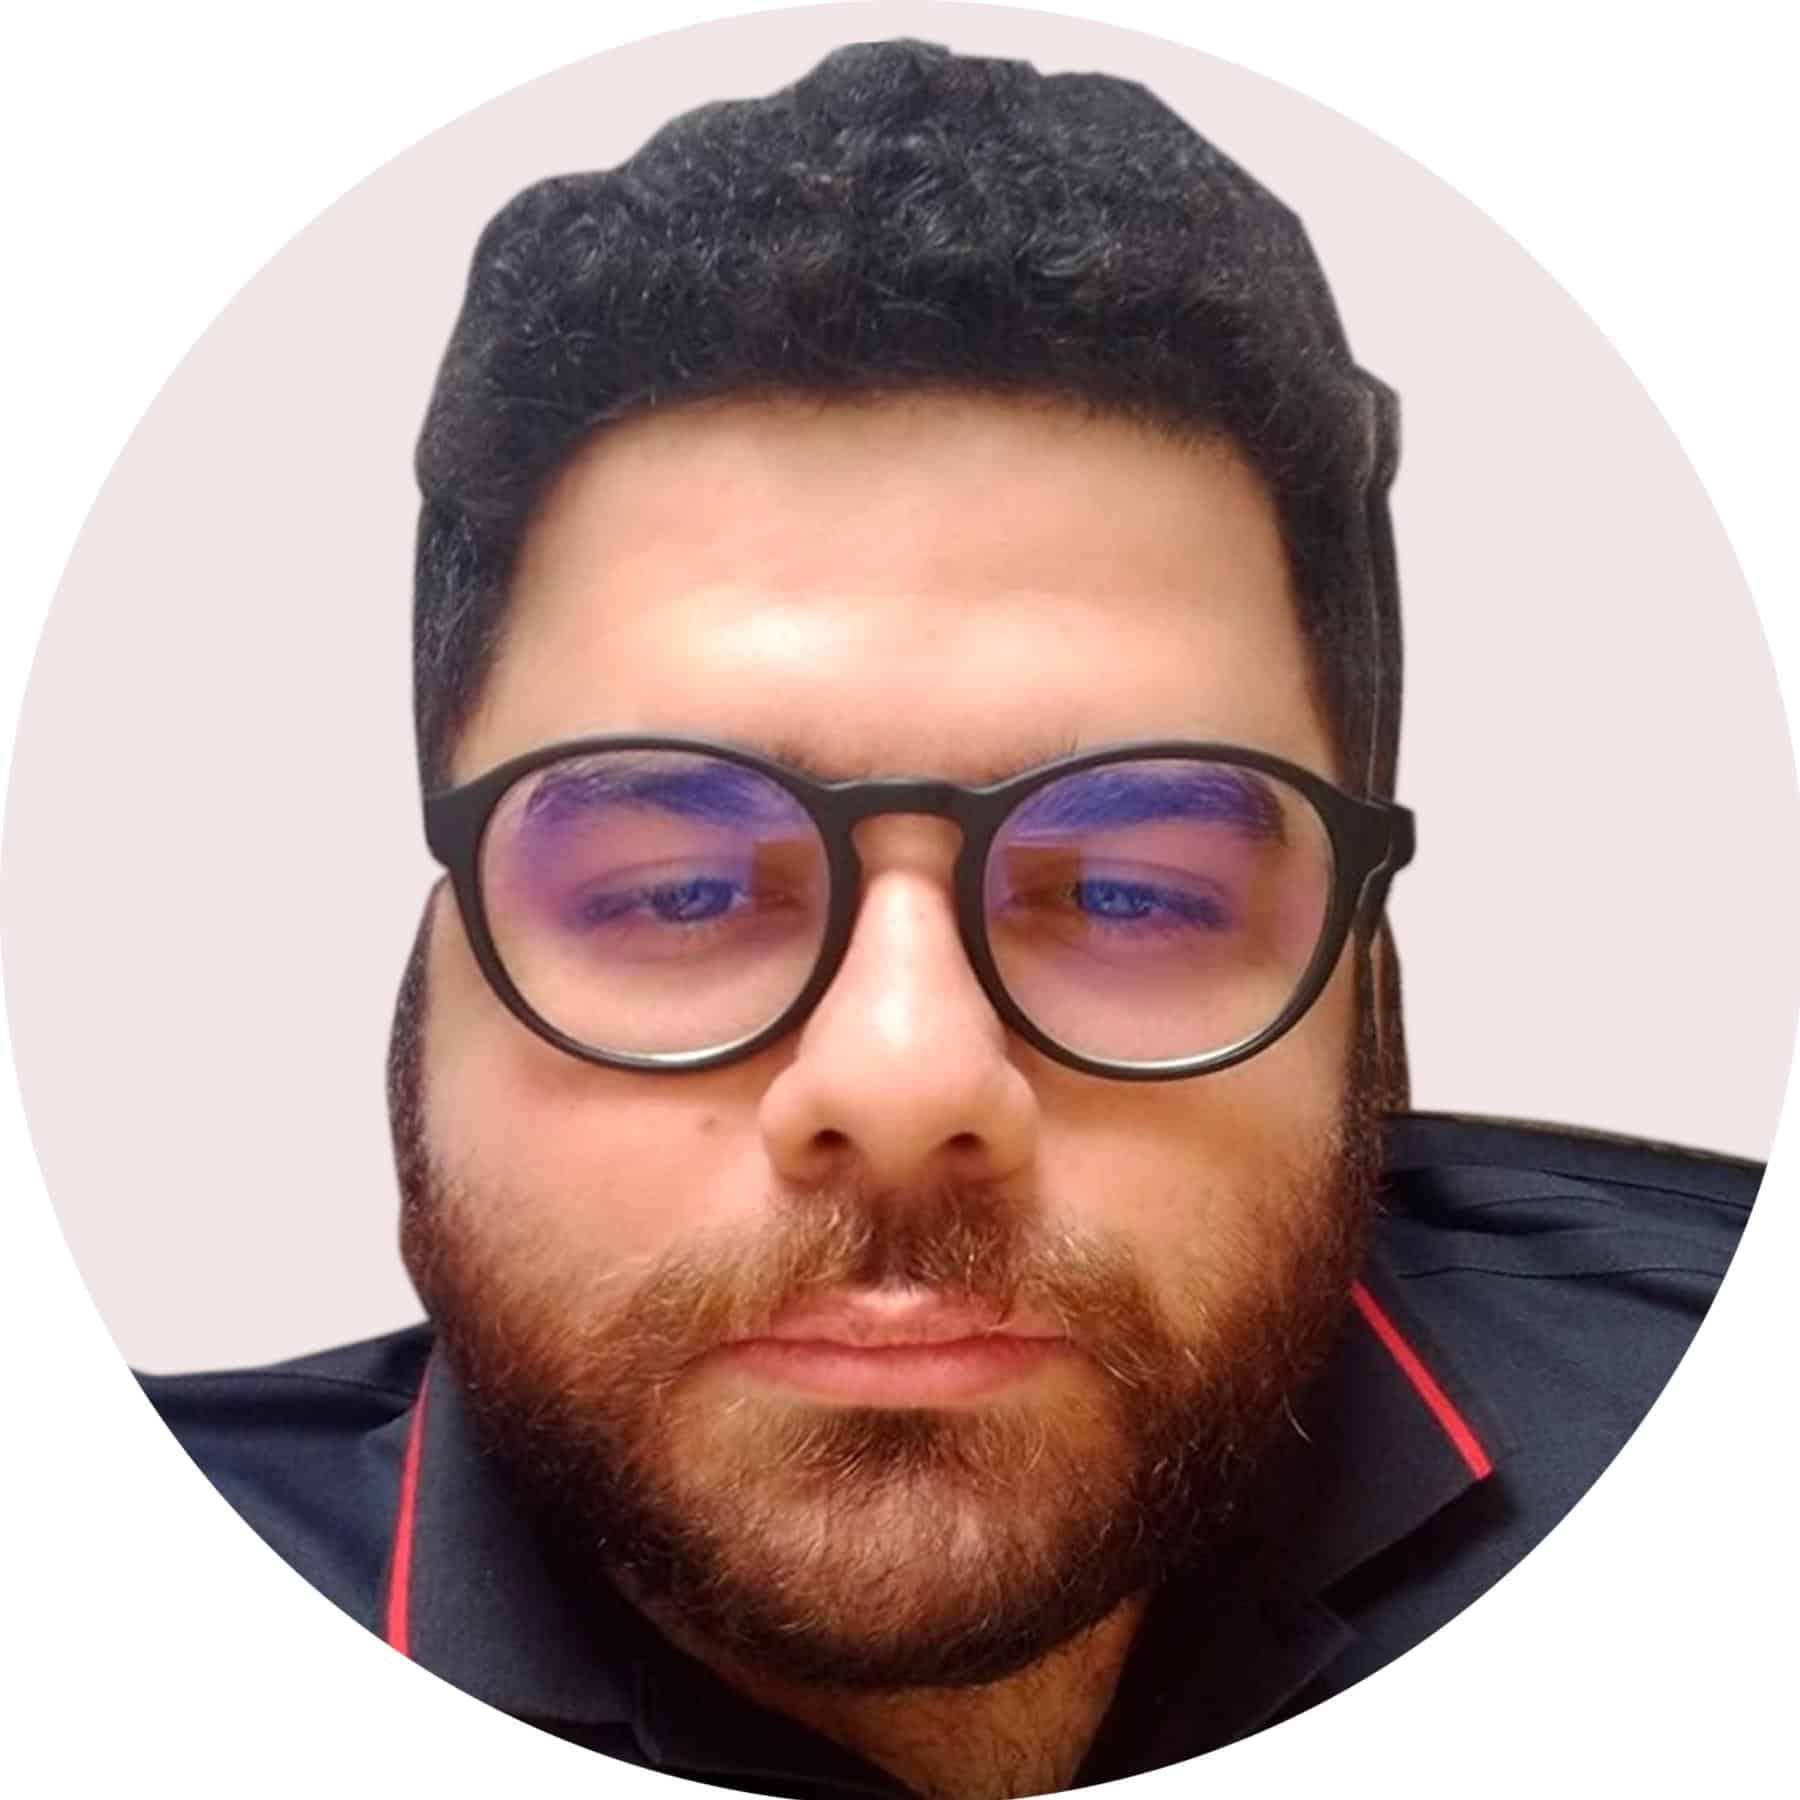 Mauro betting demitido radio bandeirantes am ao ig betting